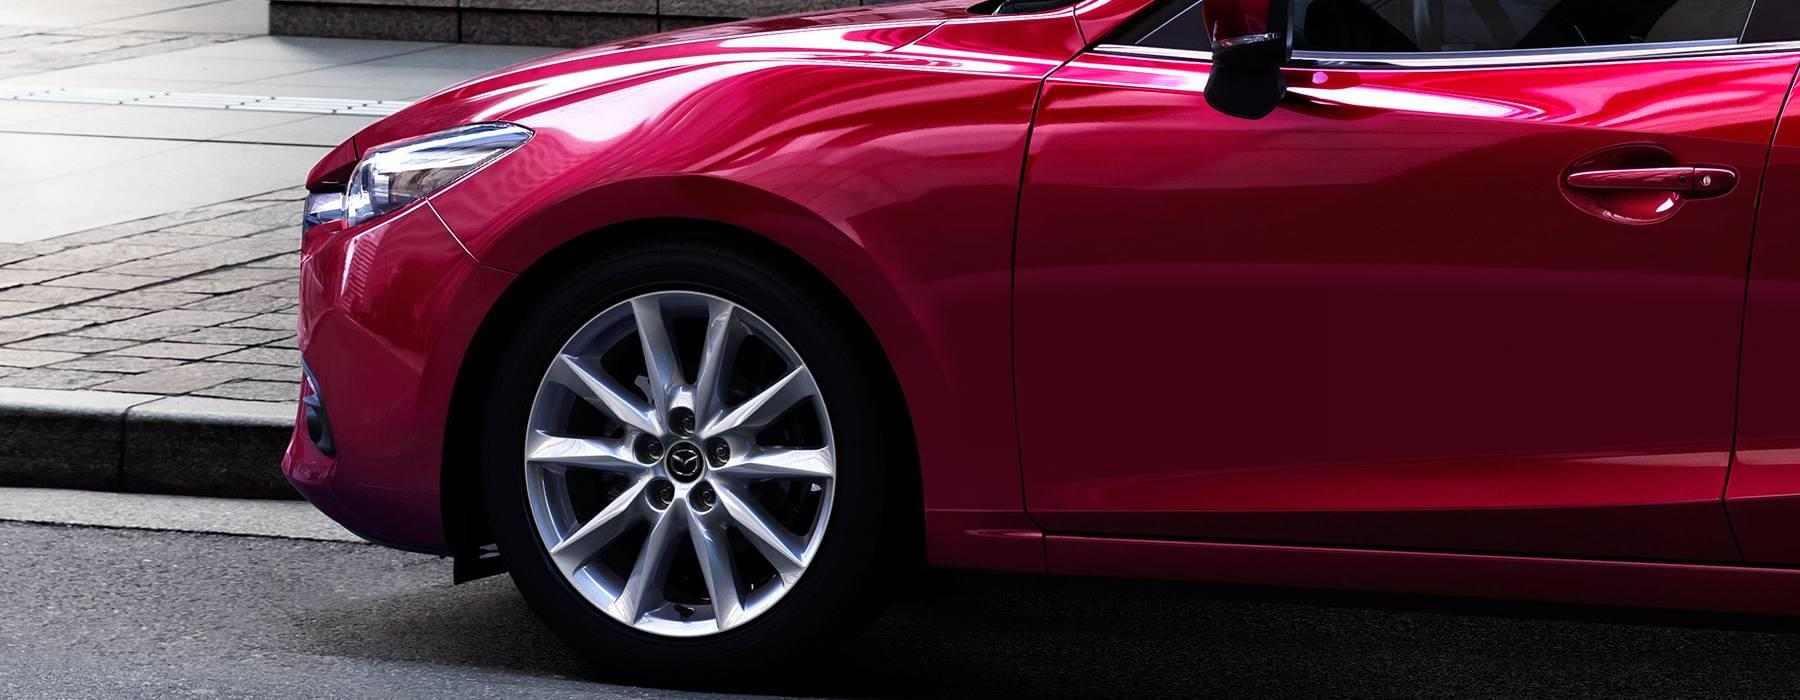 Mazda 3 Service Manual: Wheels, Tires